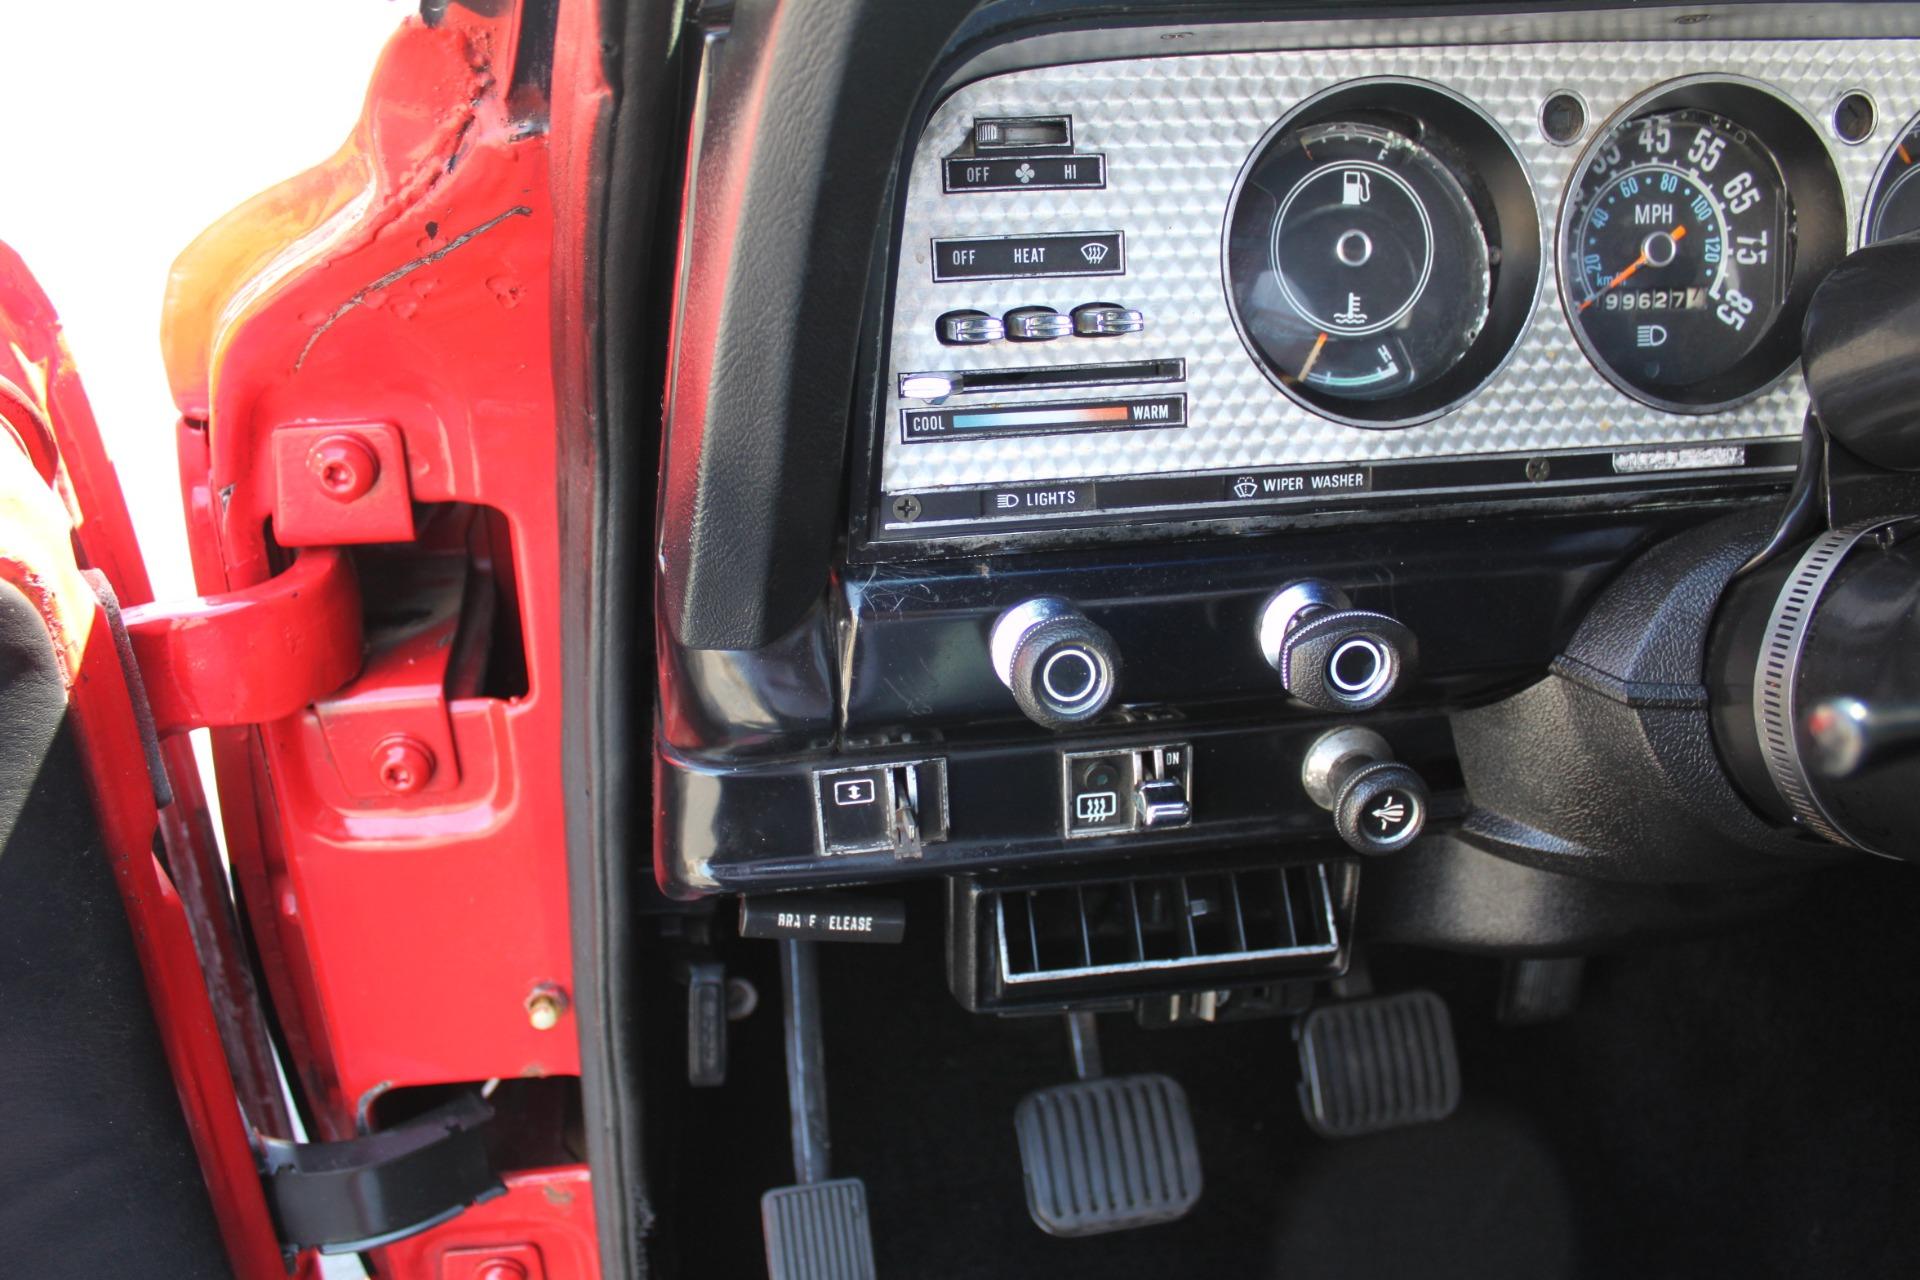 Used-1983-Jeep-Cherokee-4WD-Chief-Range-Rover